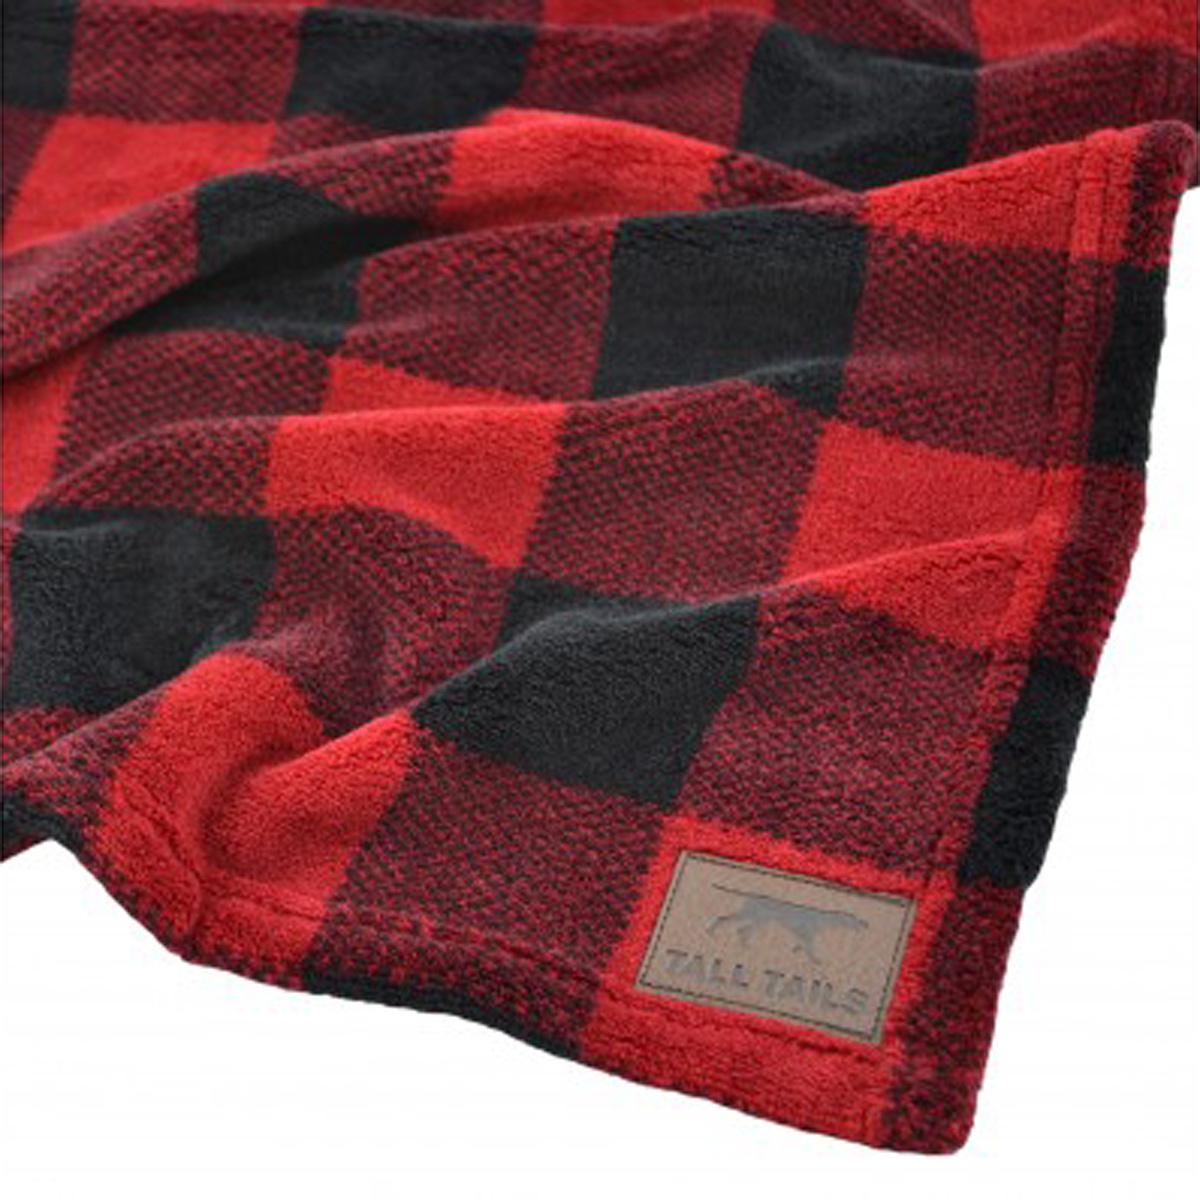 Tall Tails Fleece Dog Blanket - Hunters Plaid with Same ...